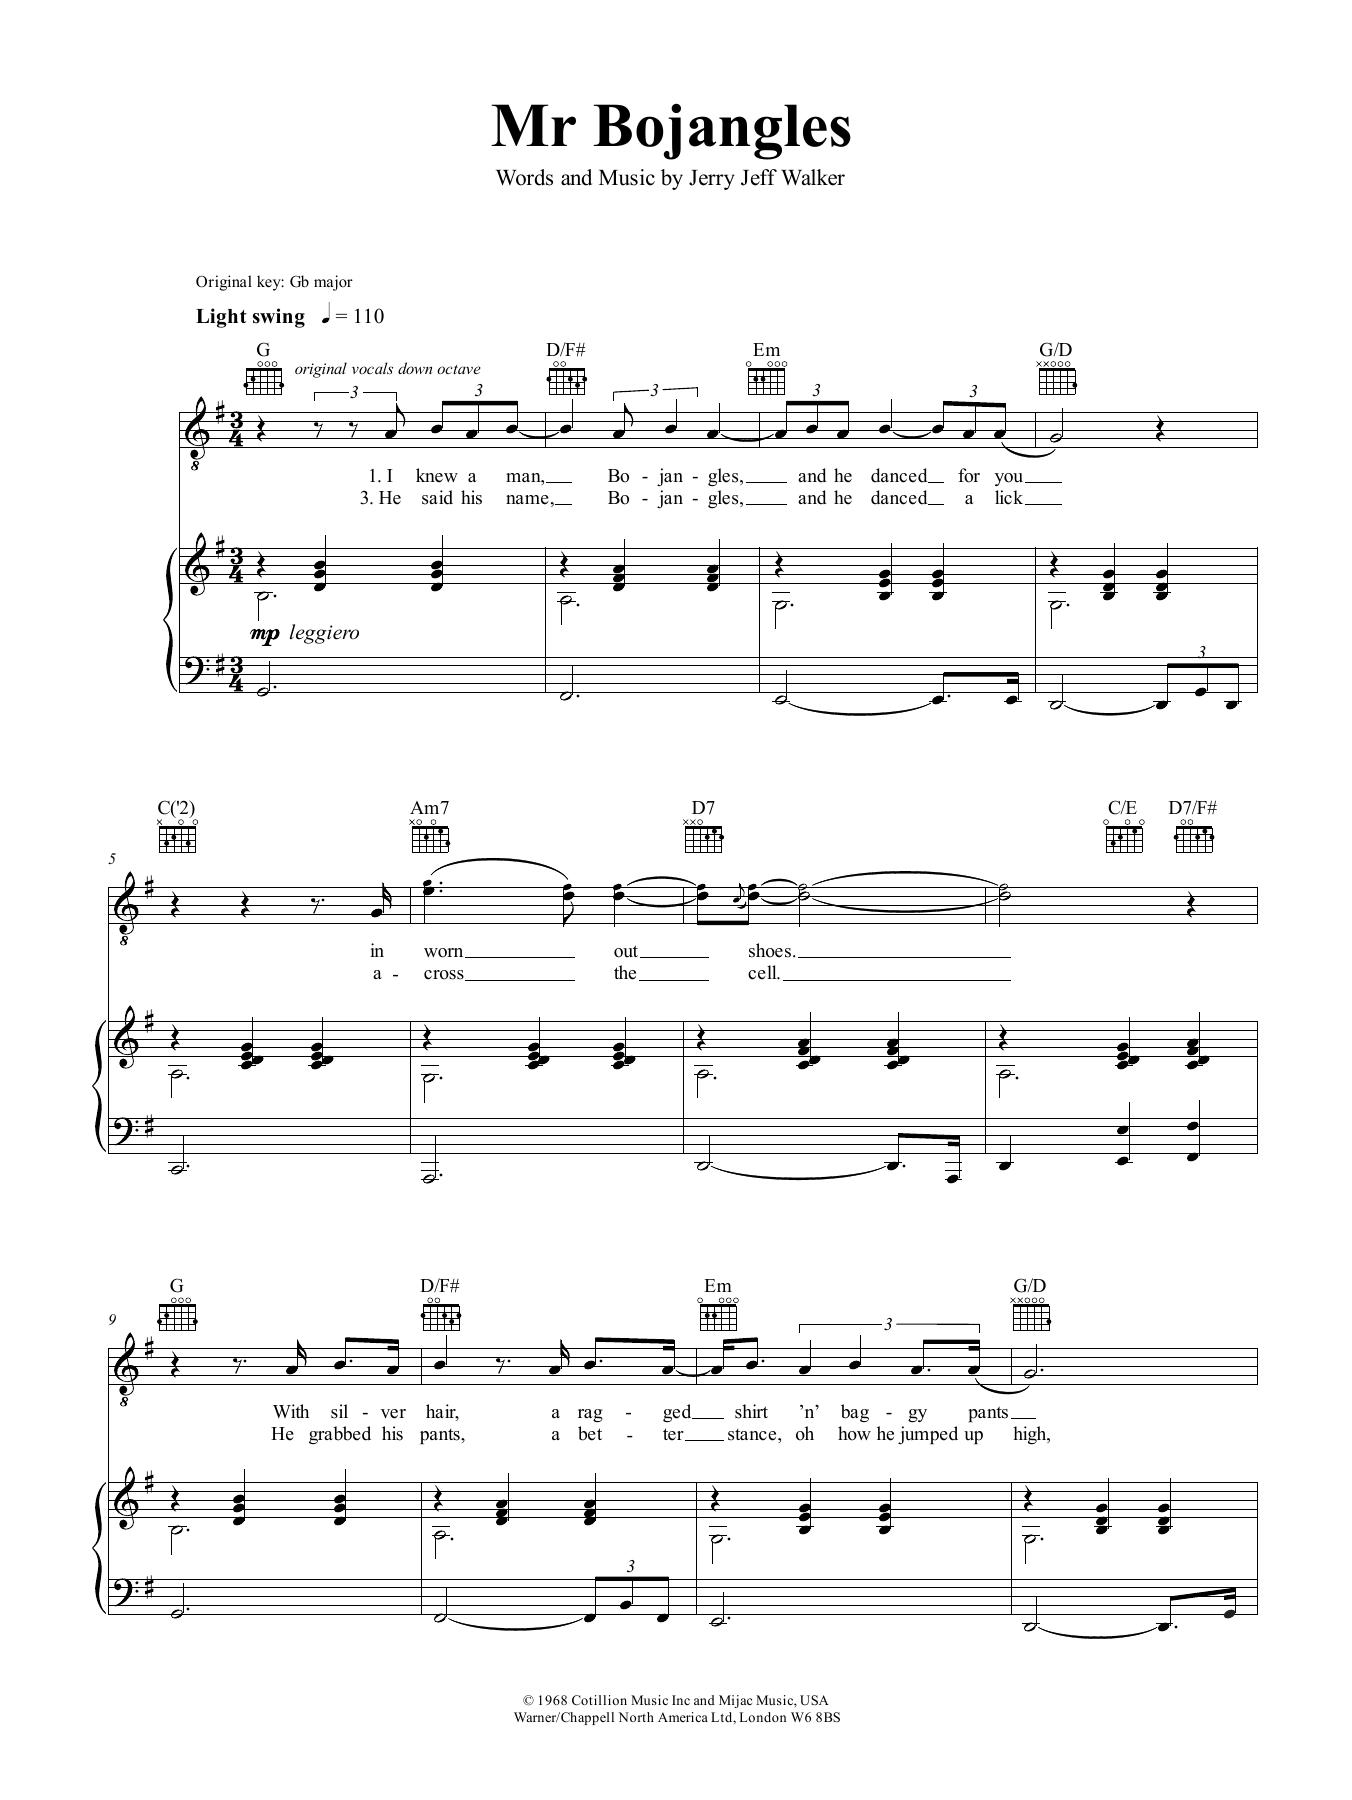 Nina Simone Mr Bojangles Sheet Music Notes, Chords   Download Printable  Piano, Vocal & Guitar Right Hand Melody PDF Score   SKU 15